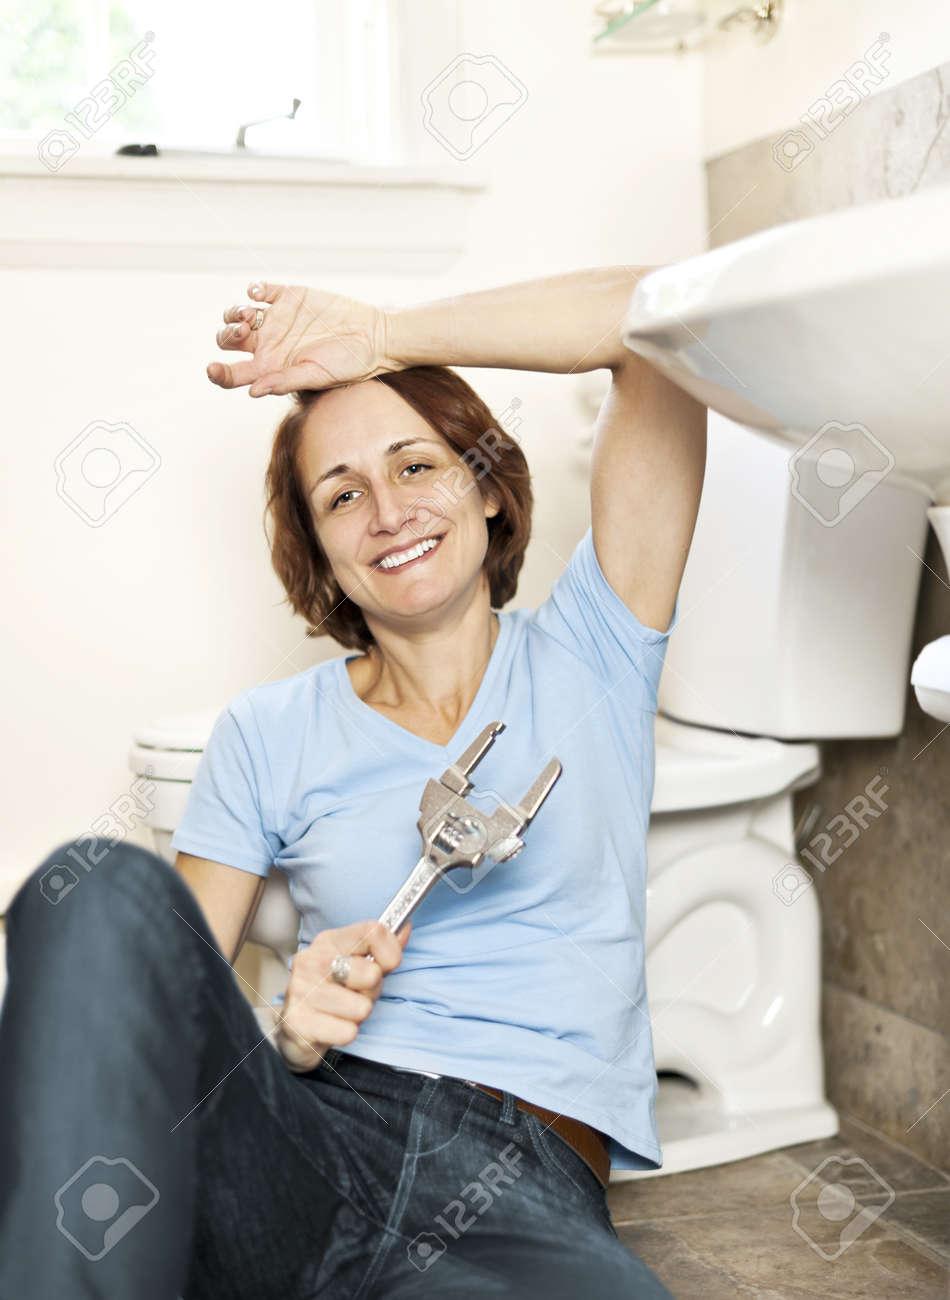 Woman repairing sink in bathroom at home Stock Photo - 12389841